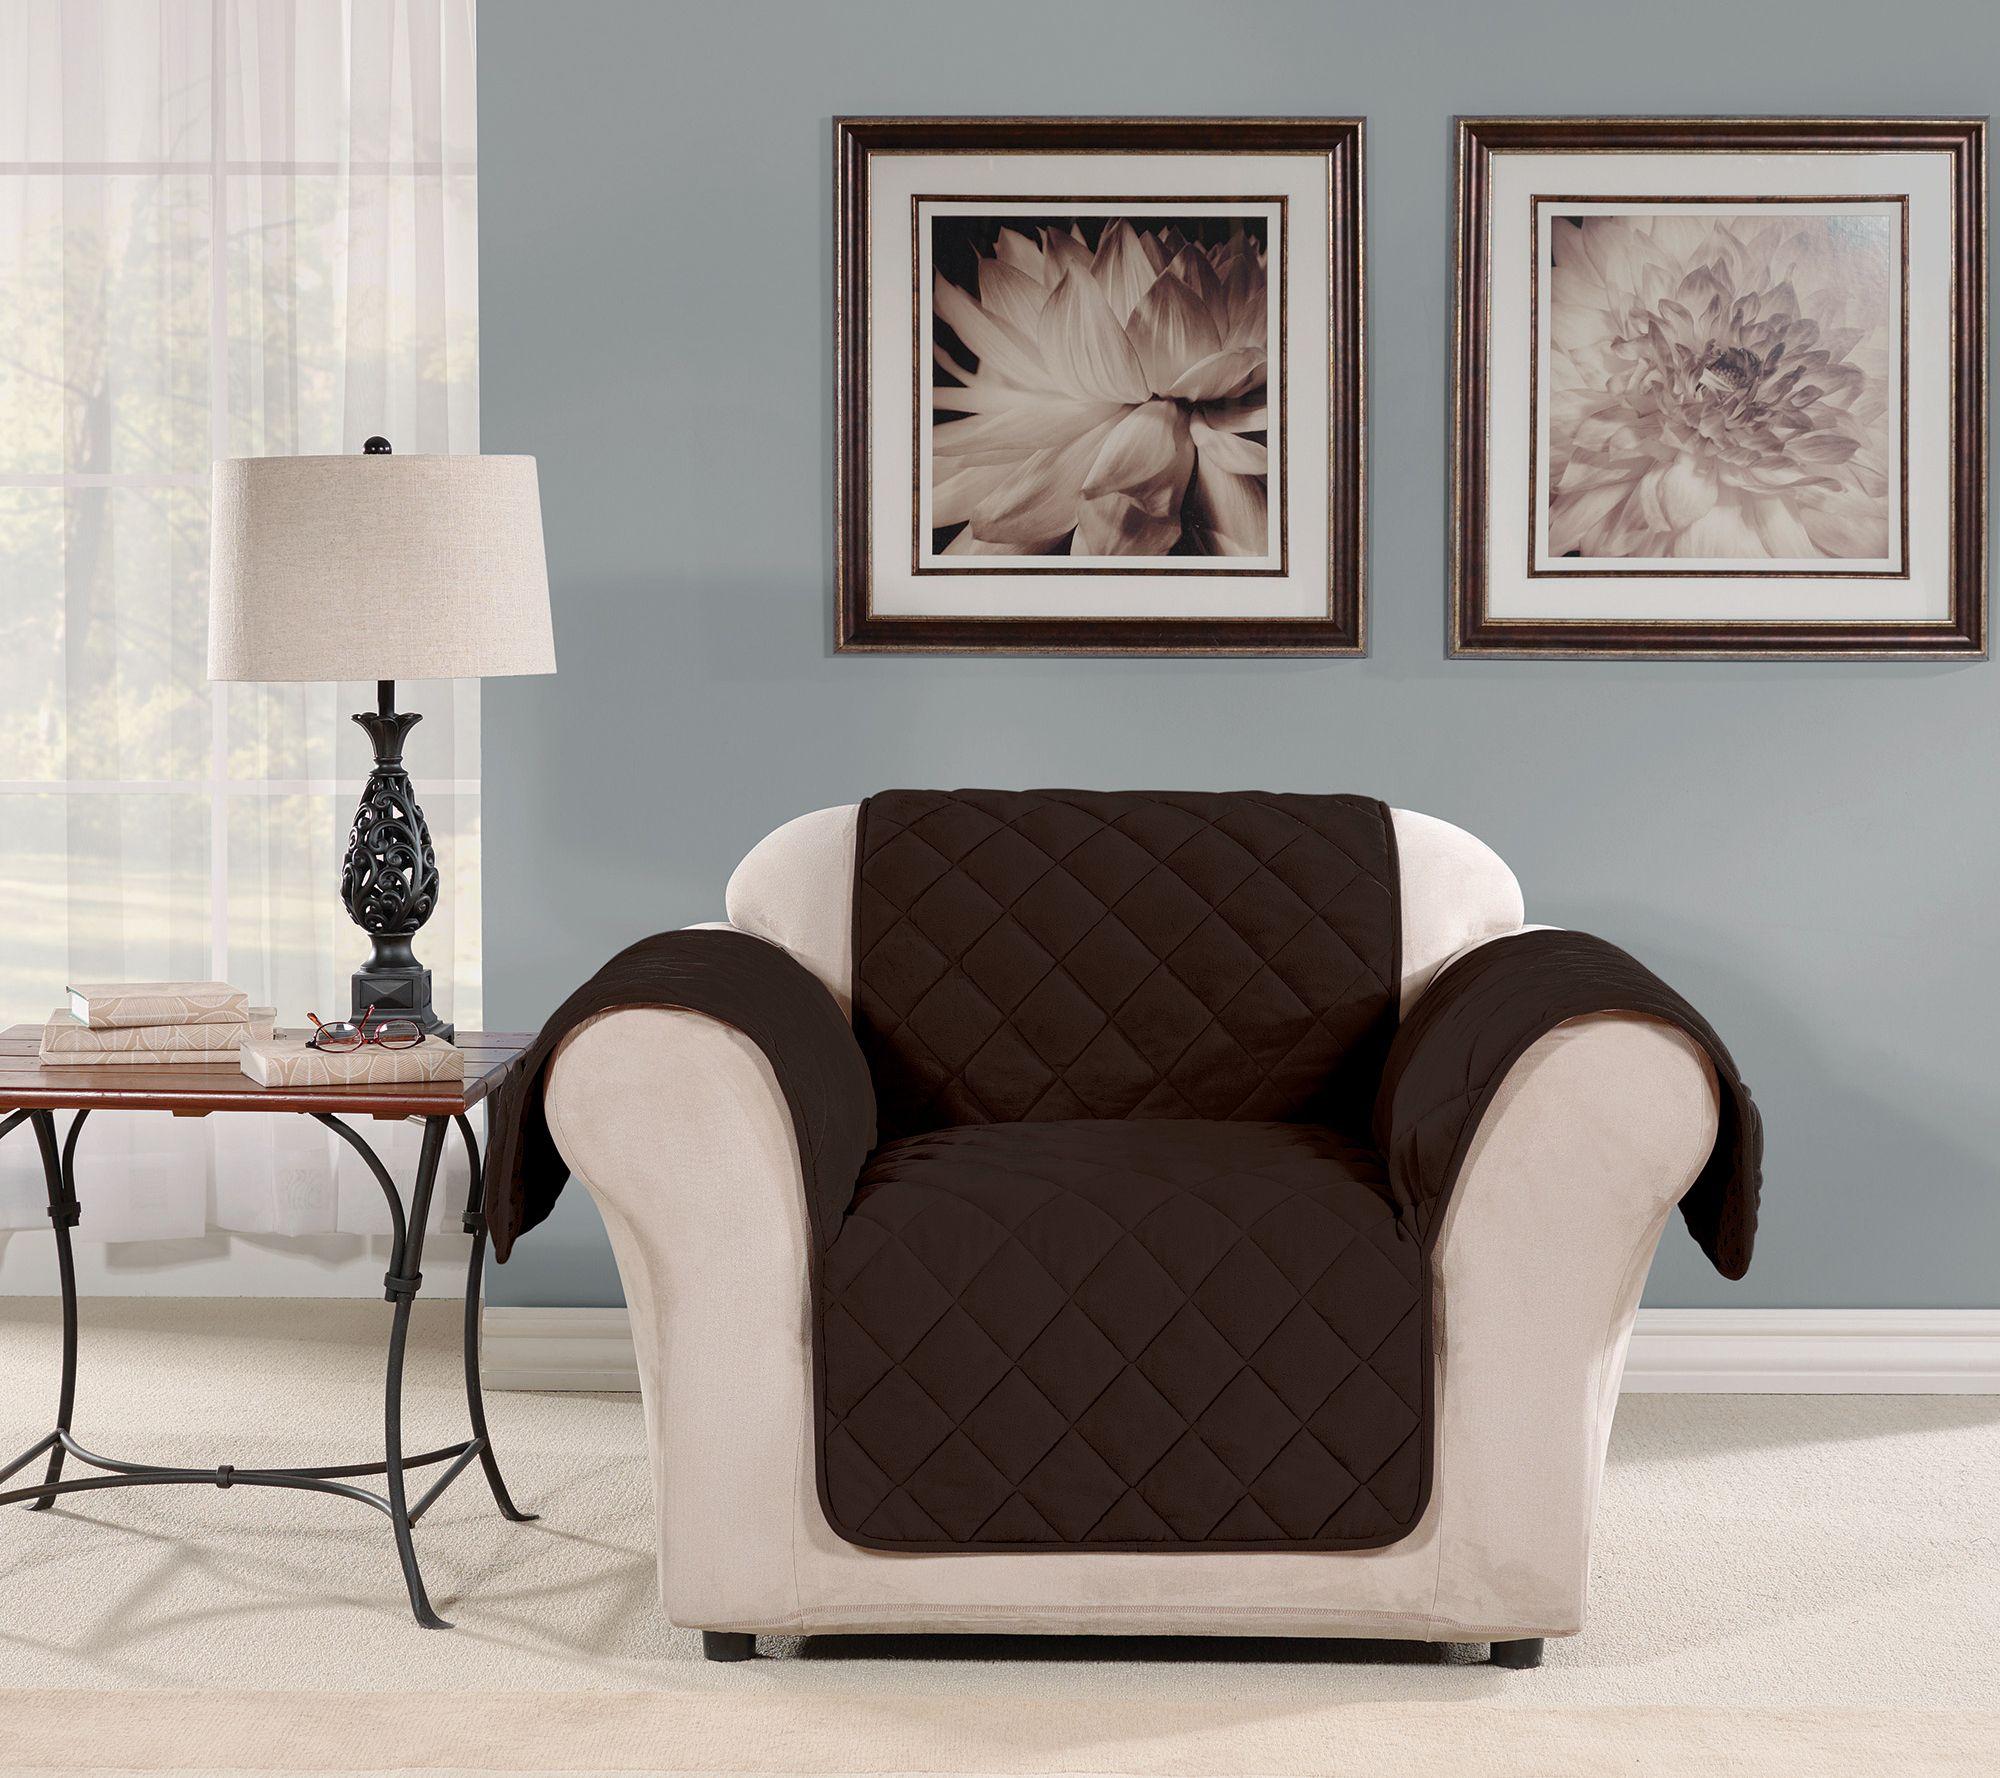 Sure Fit Chair Plush Comfort Waterproof Furniture Cover